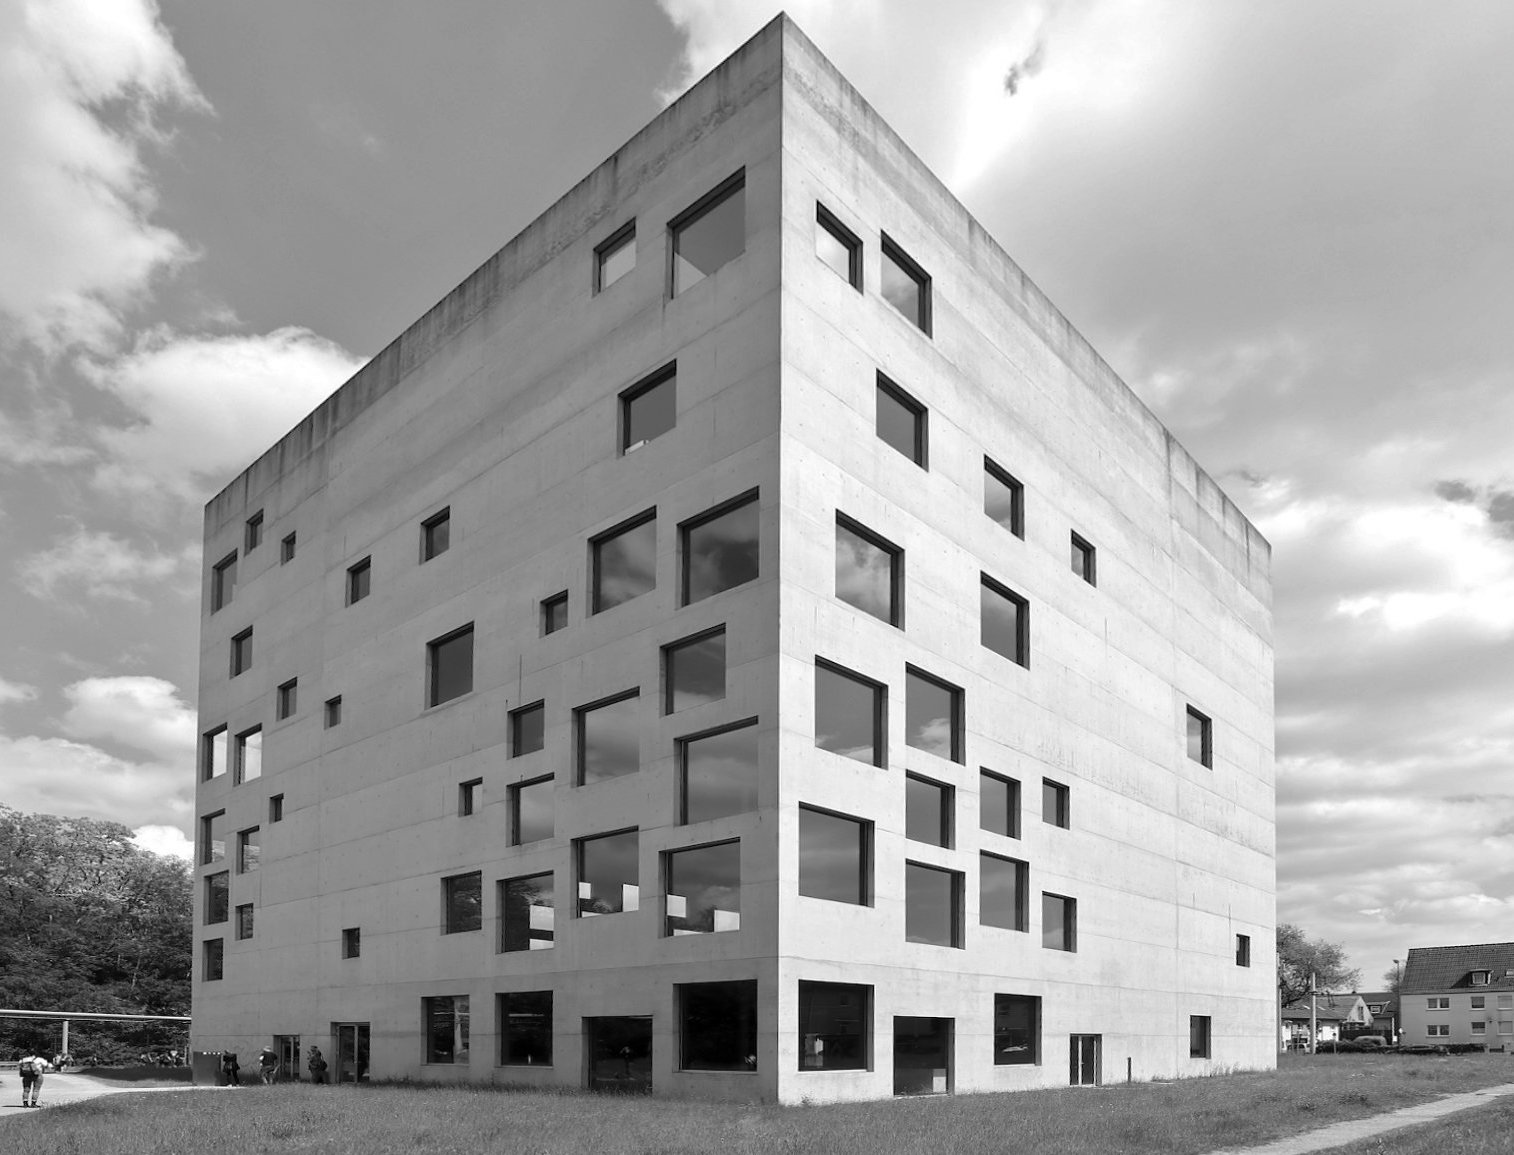 SANAA Gebäude. Entwurf: Sejima and Nishizawa and Associates (SANAA) mit den Architekten Nicole Berganski, Böll und Krabel. Fertigstellung: 2006.